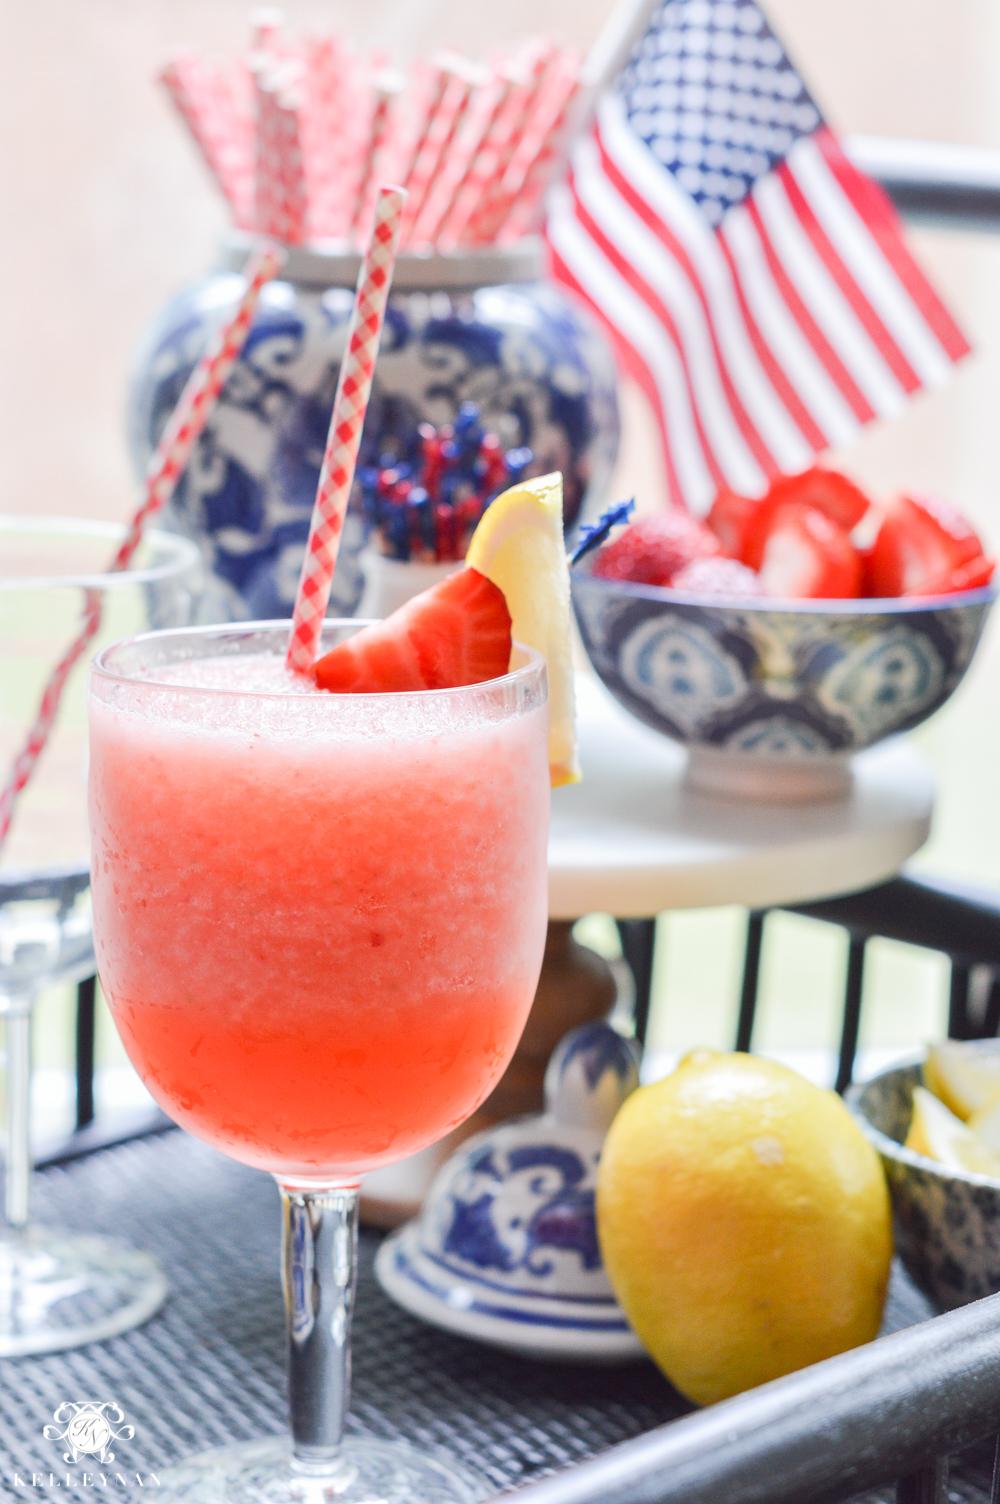 Fourth of July Decor and Strawberry Lemon-Limeade Rum Slush Drink Recipe on bar cart